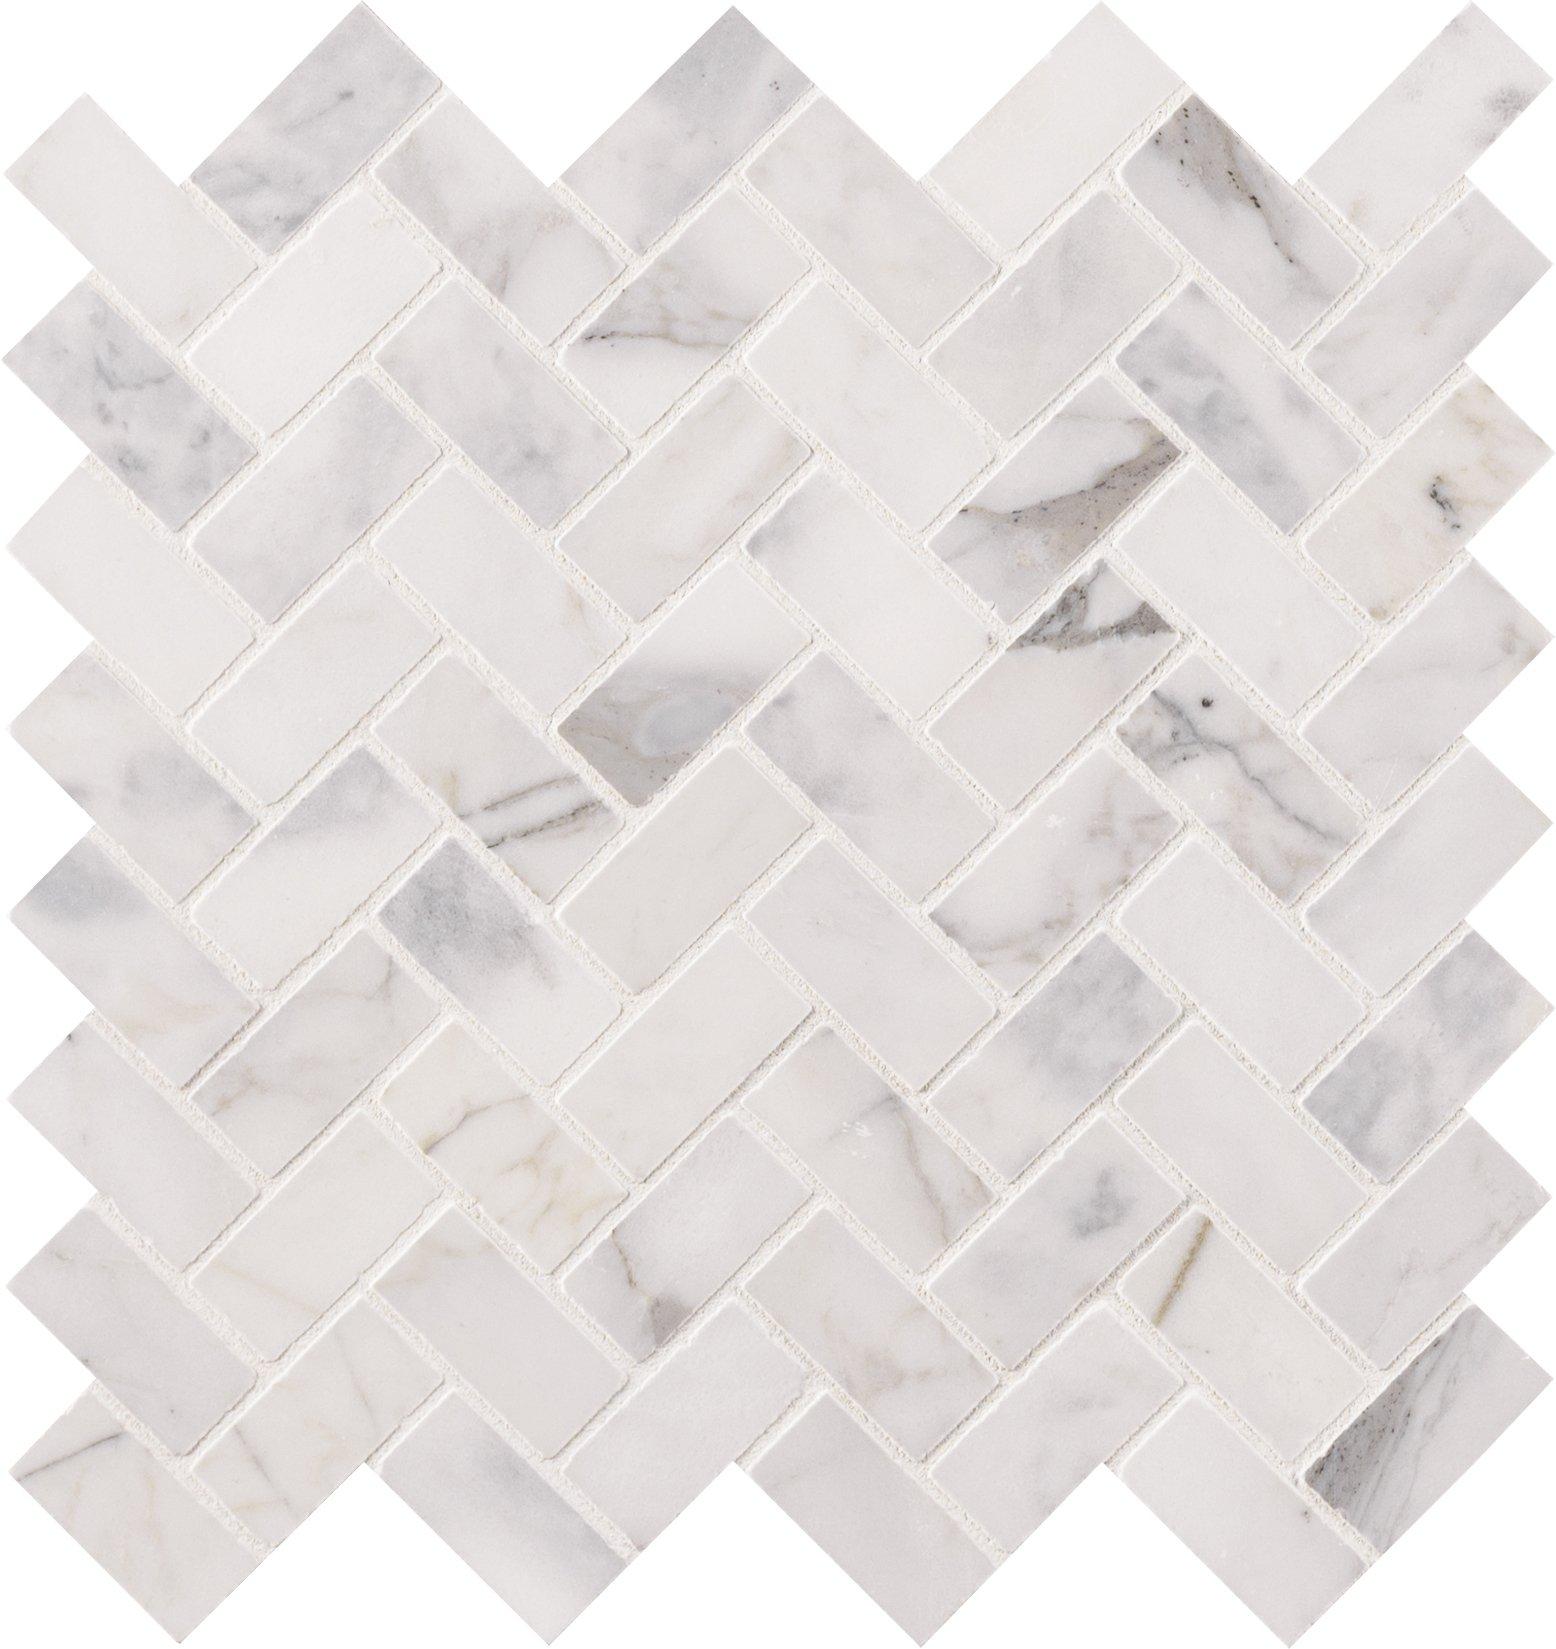 MS International AMZ-MD-00116 Calacatta Cressa Herringbone Honed Marble Tile 11.6 in. x 11.61 in. White 10 Piece